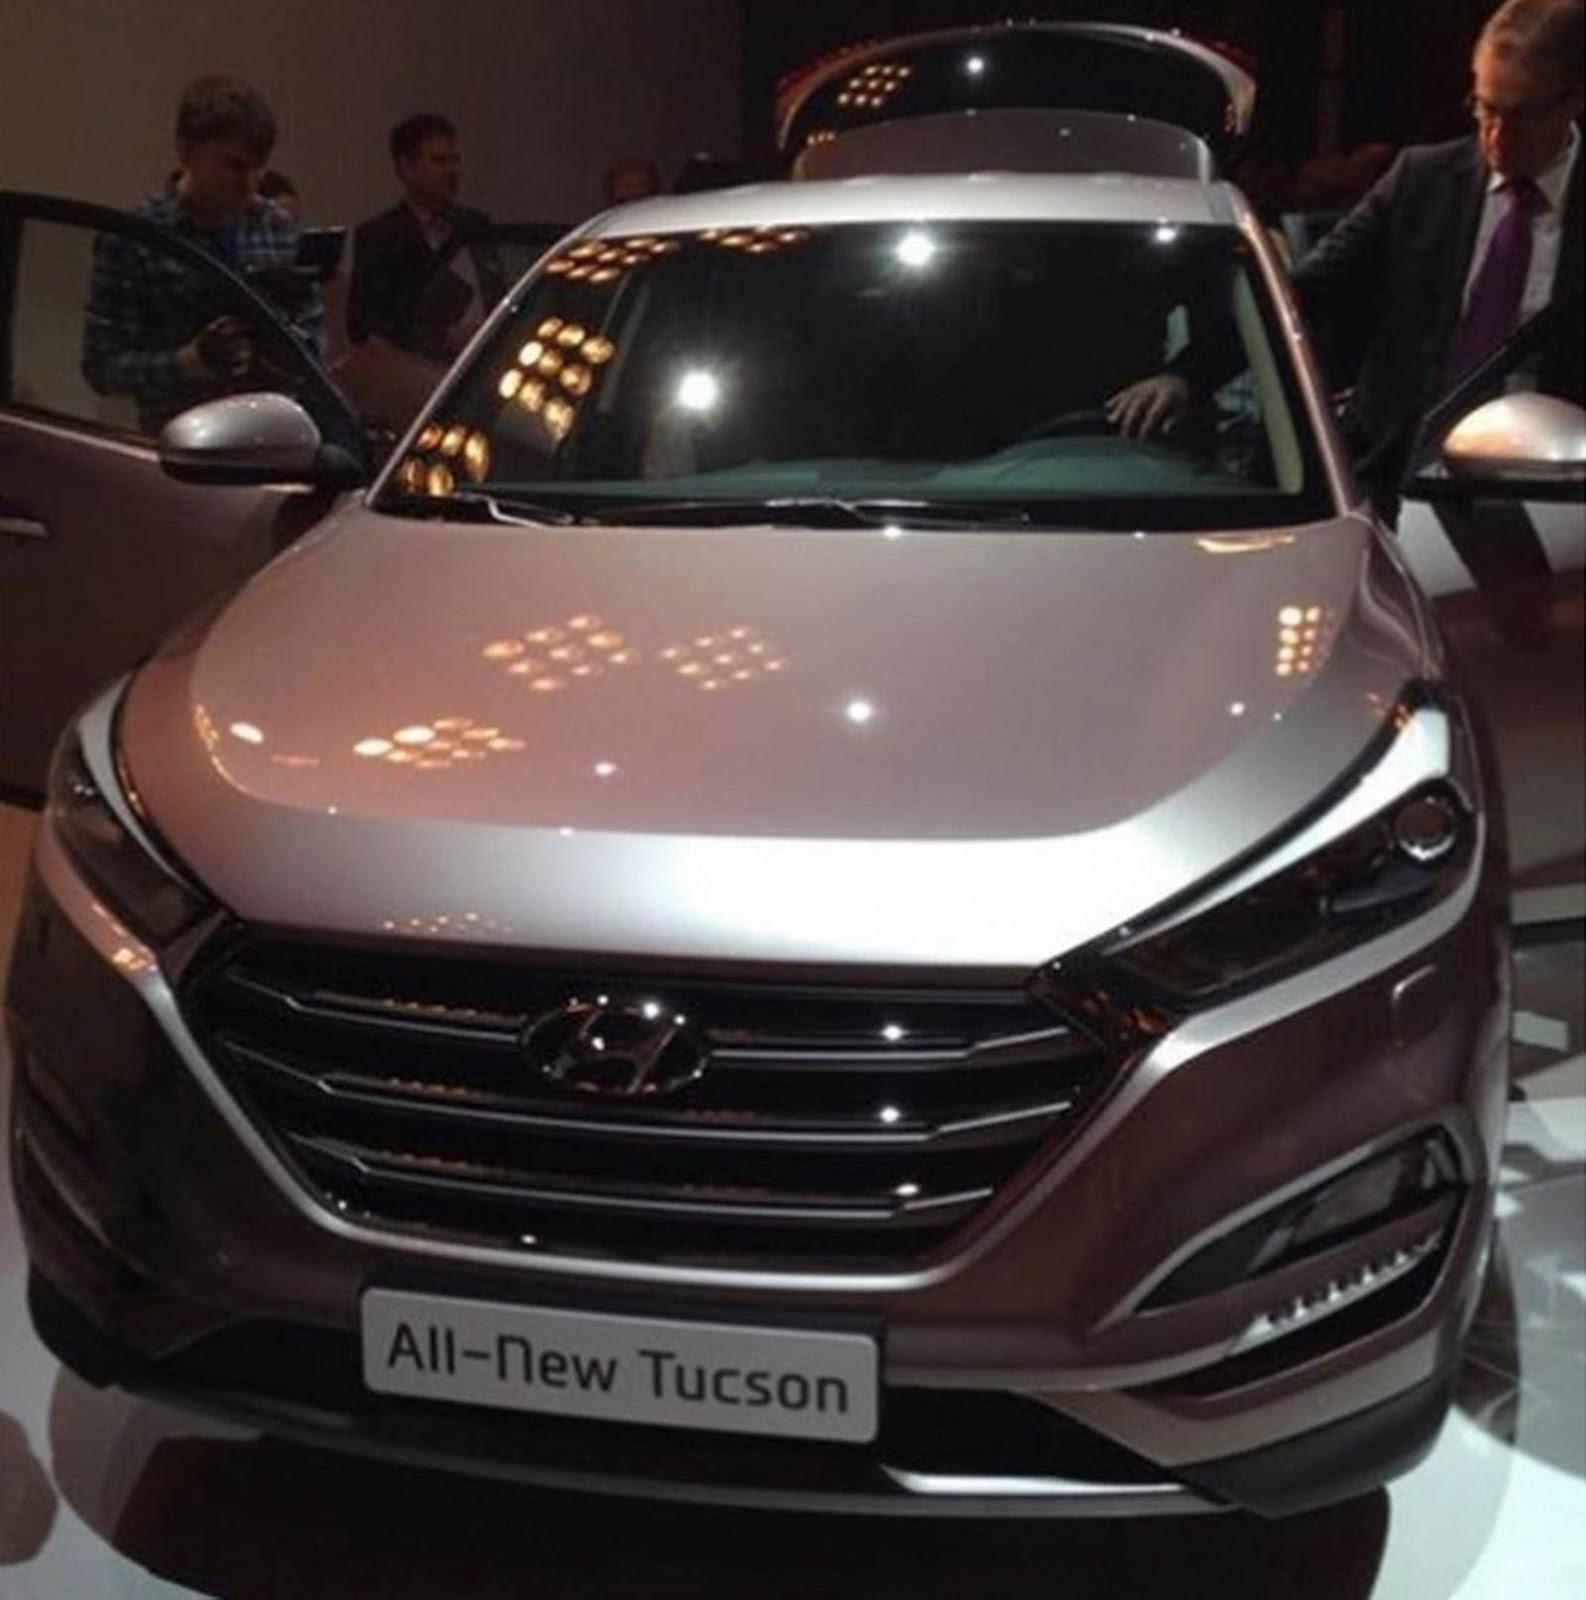 Novo Hyundai Tucson 2016 - frente